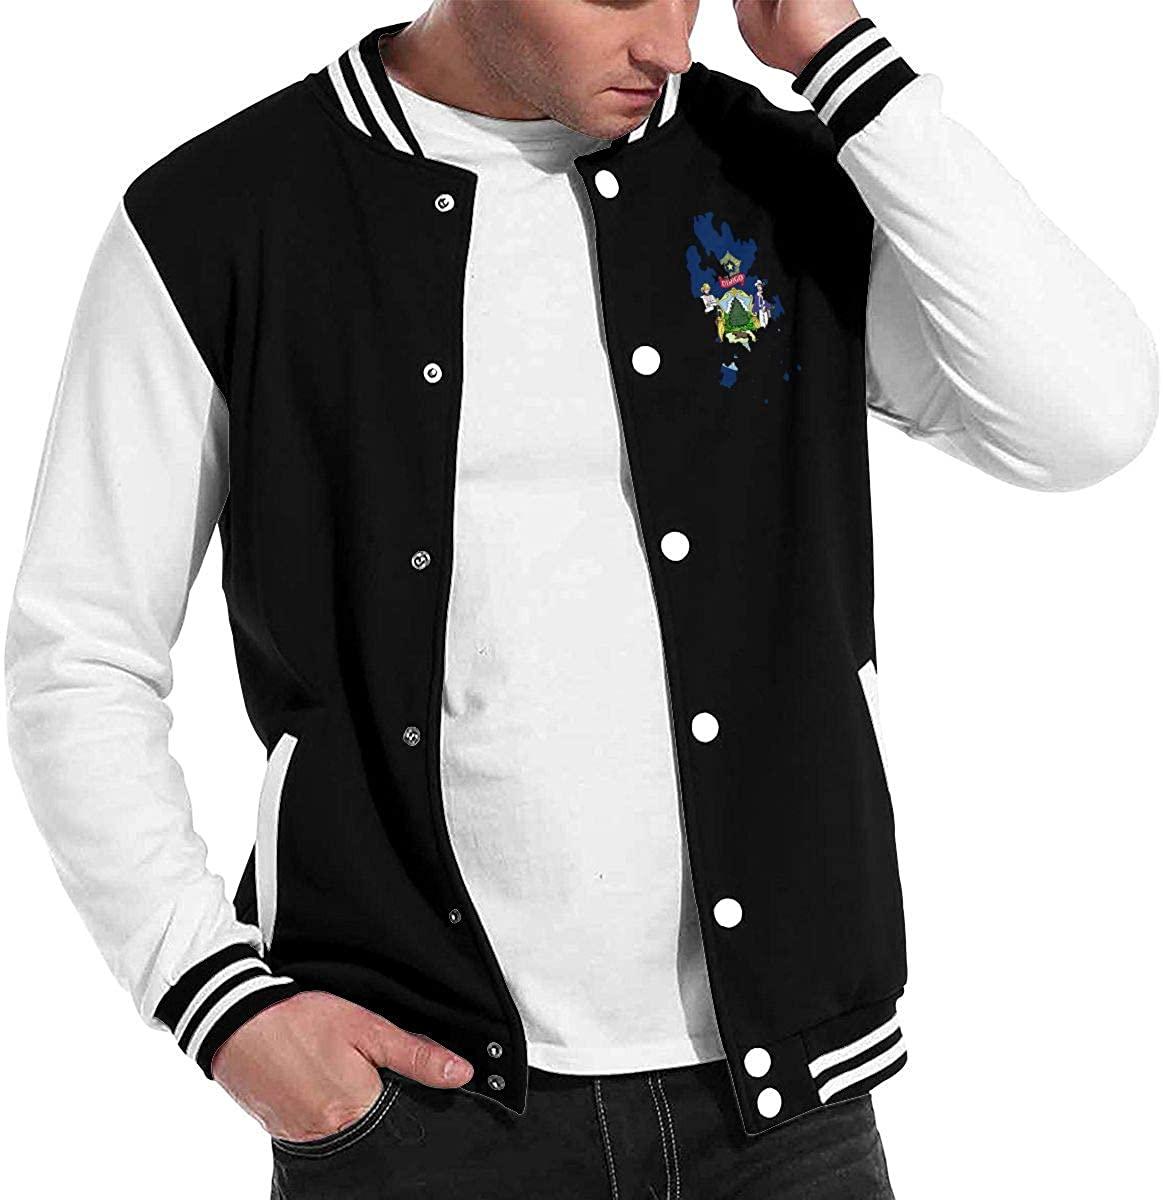 Maine State Art Baseball Jacket Uniform, Men Women Varsity Premium Jacket Sweater Coat